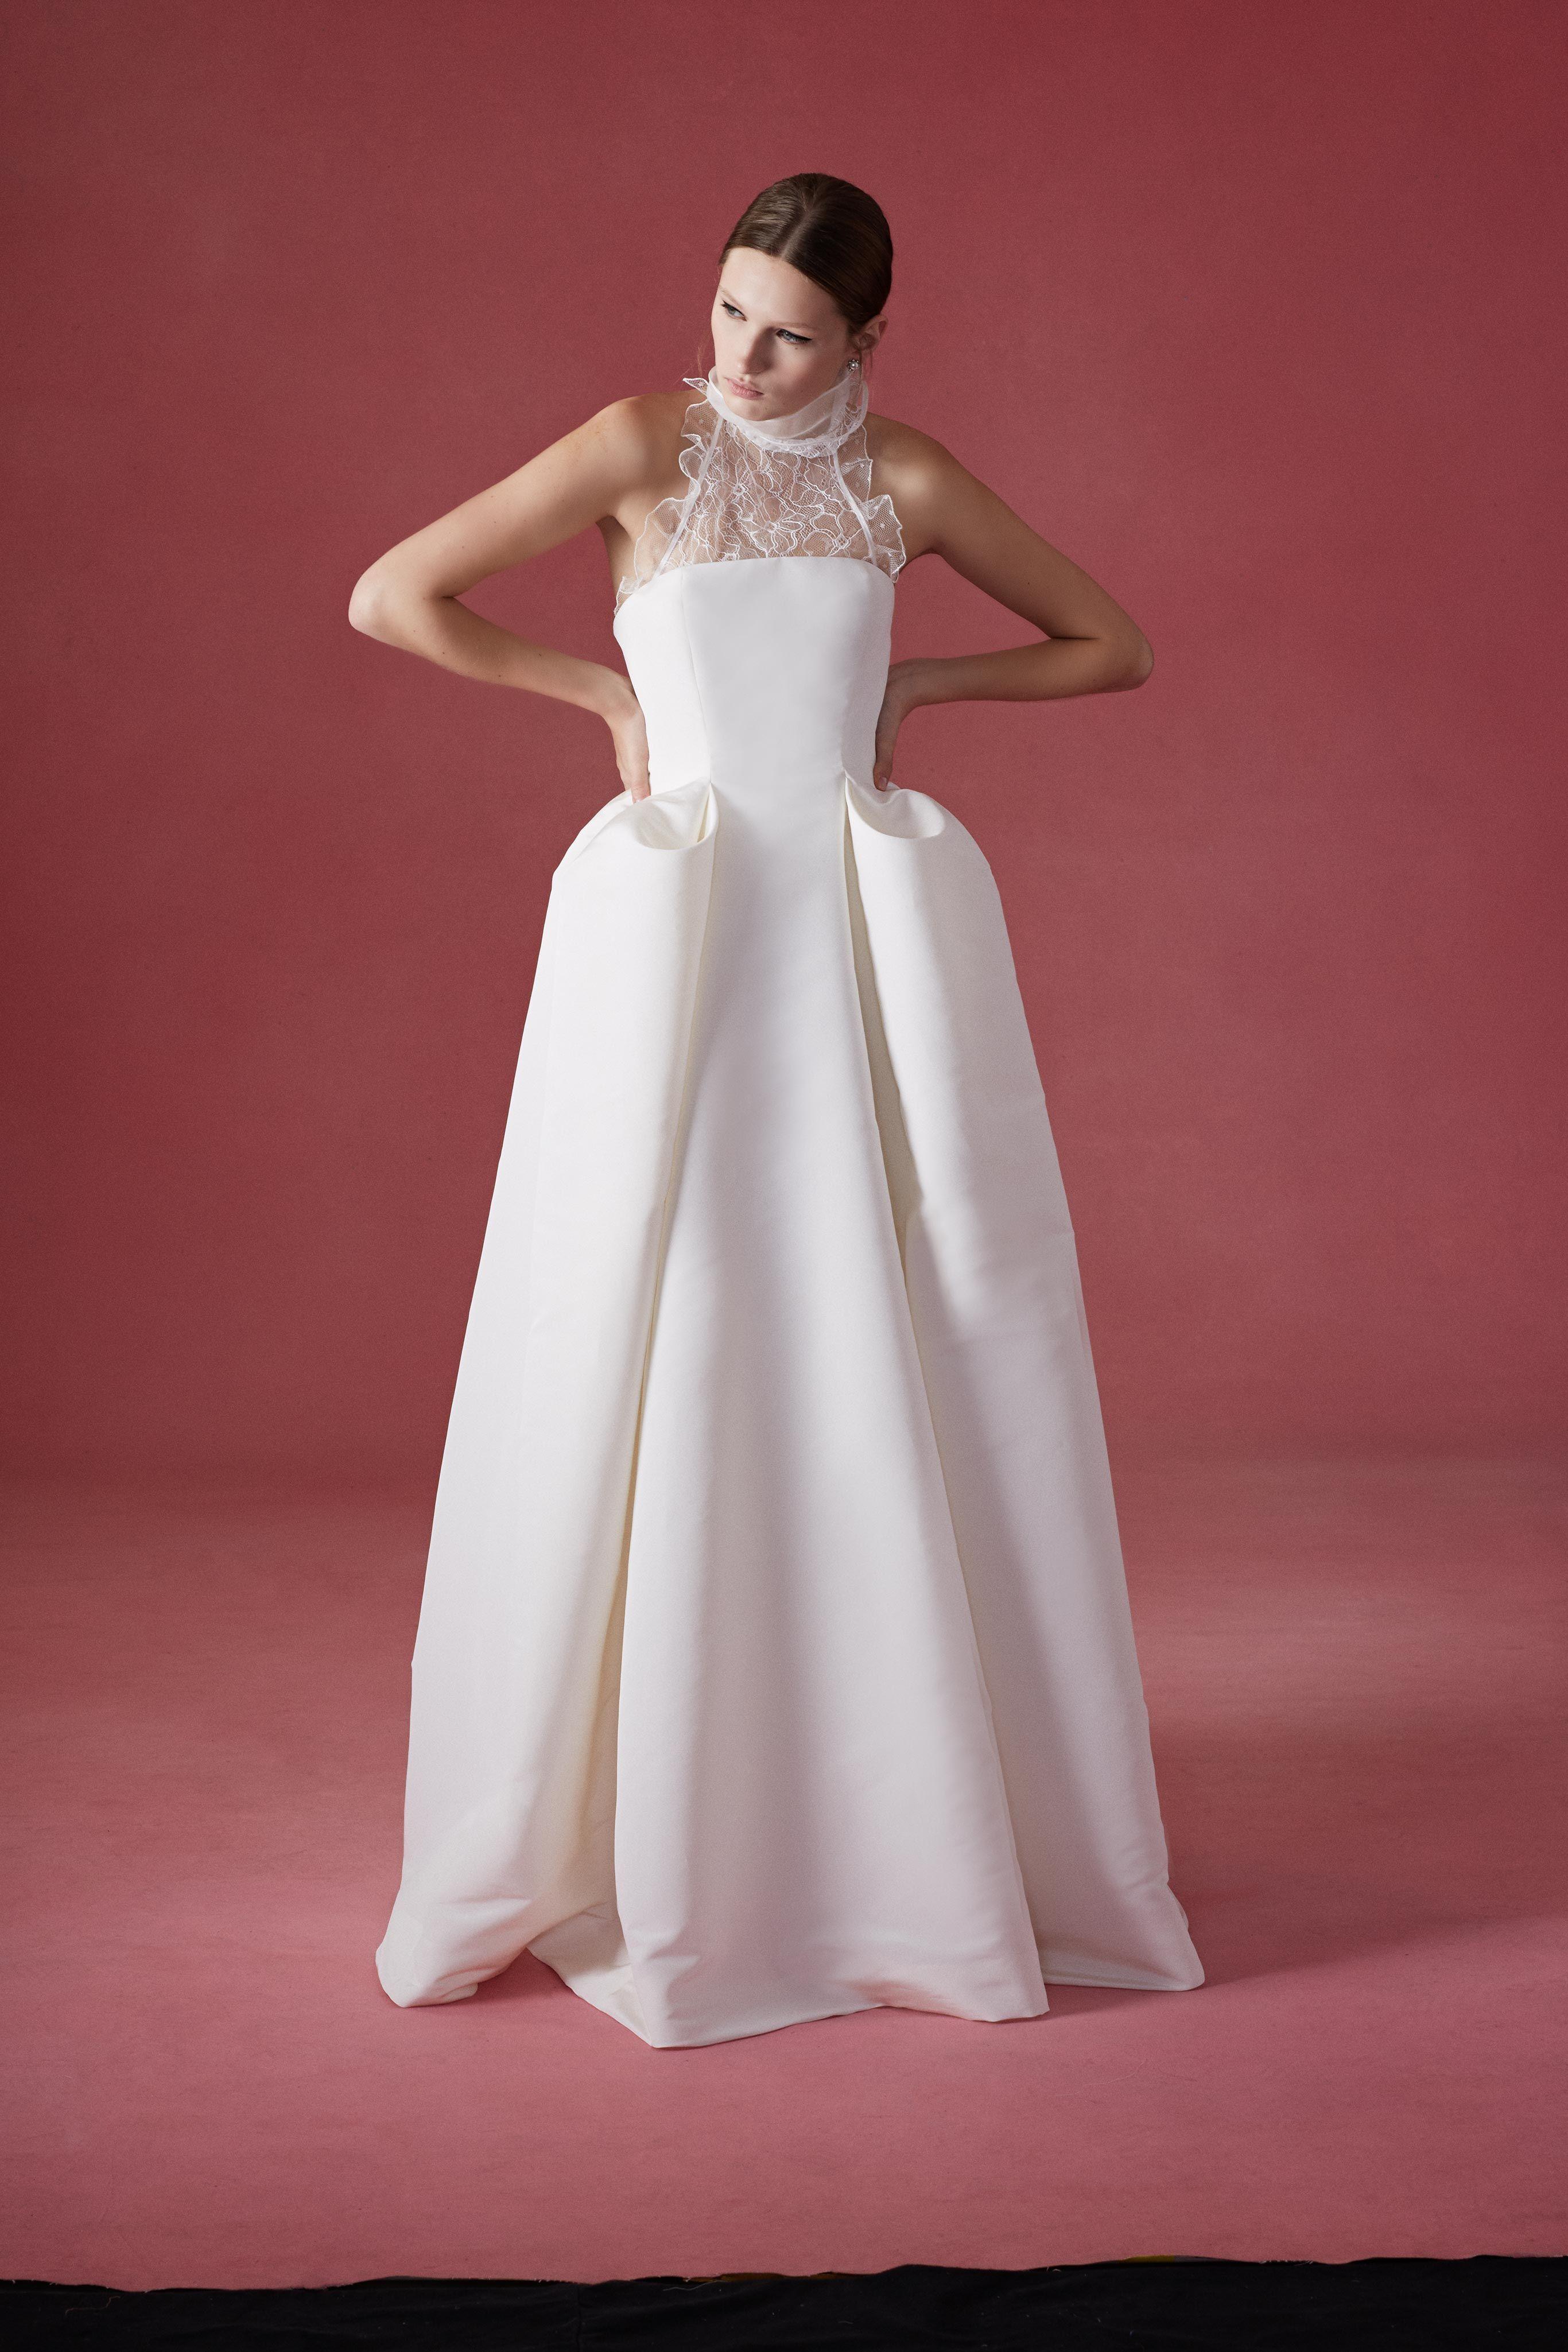 The oscar de la renta bridal collection is available at mark ingram